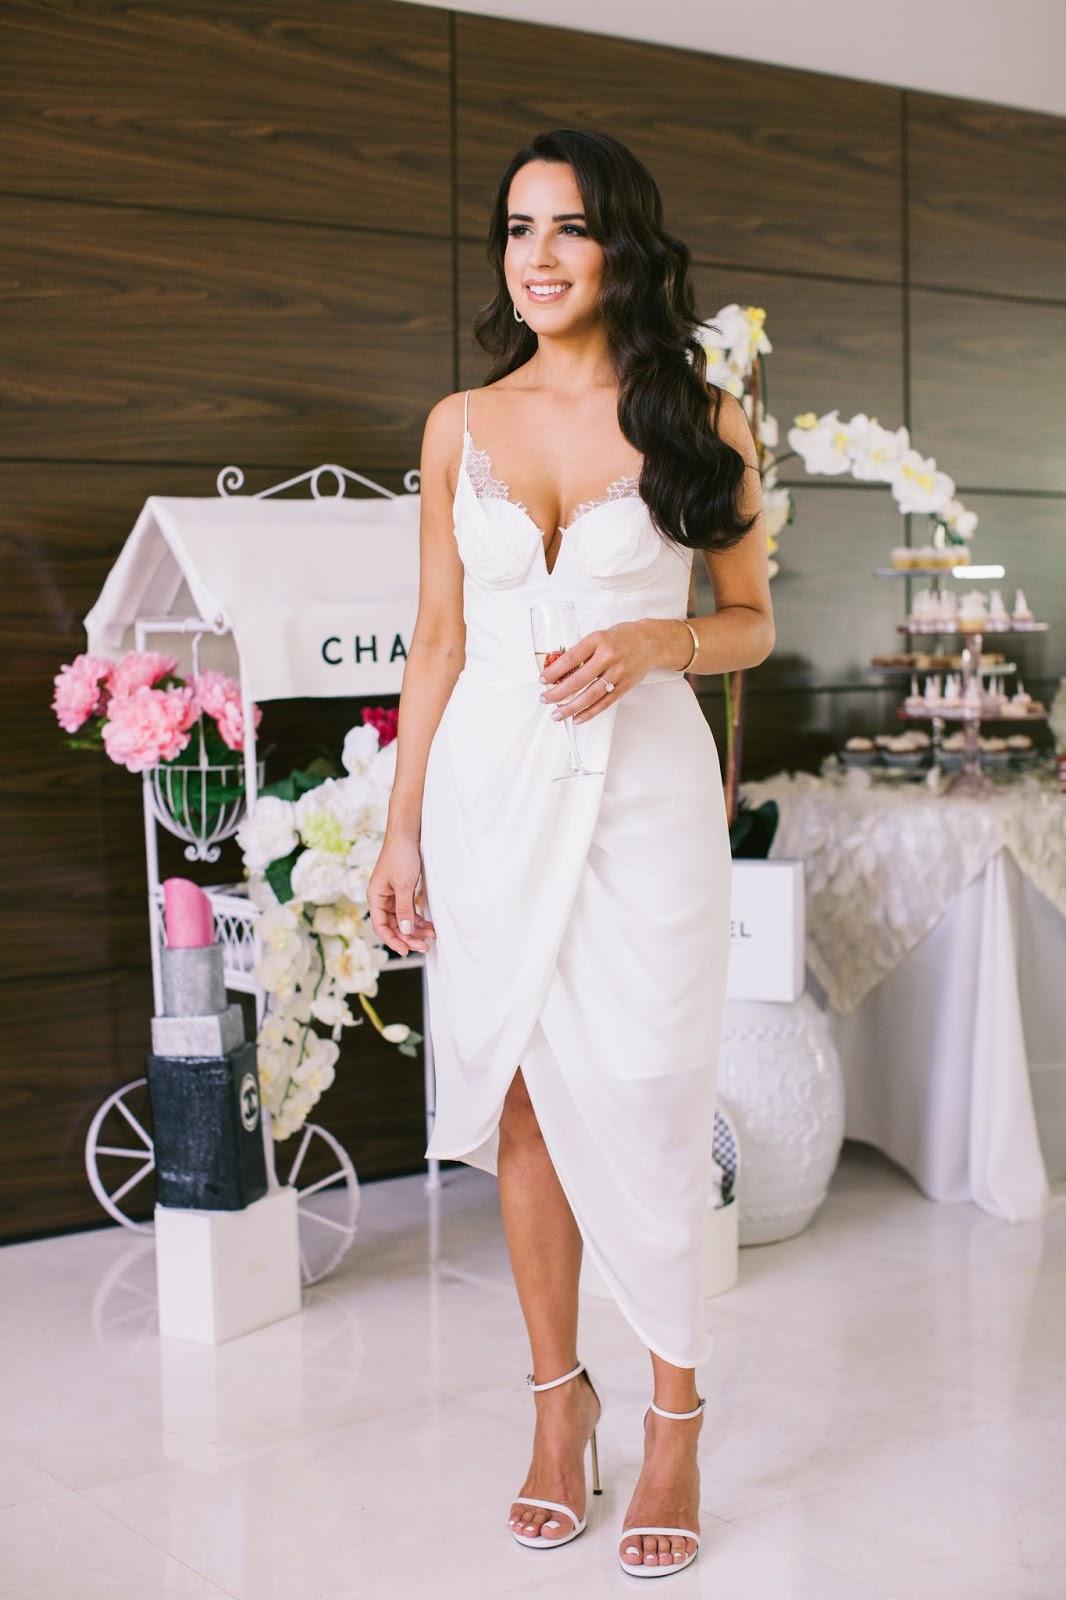 Wedding Bridal Shower Dresses dresses for wedding shower bride feather crown tiara to be kelly saks bridal zimmerman dress white lace stuart weitzman nudist fashion